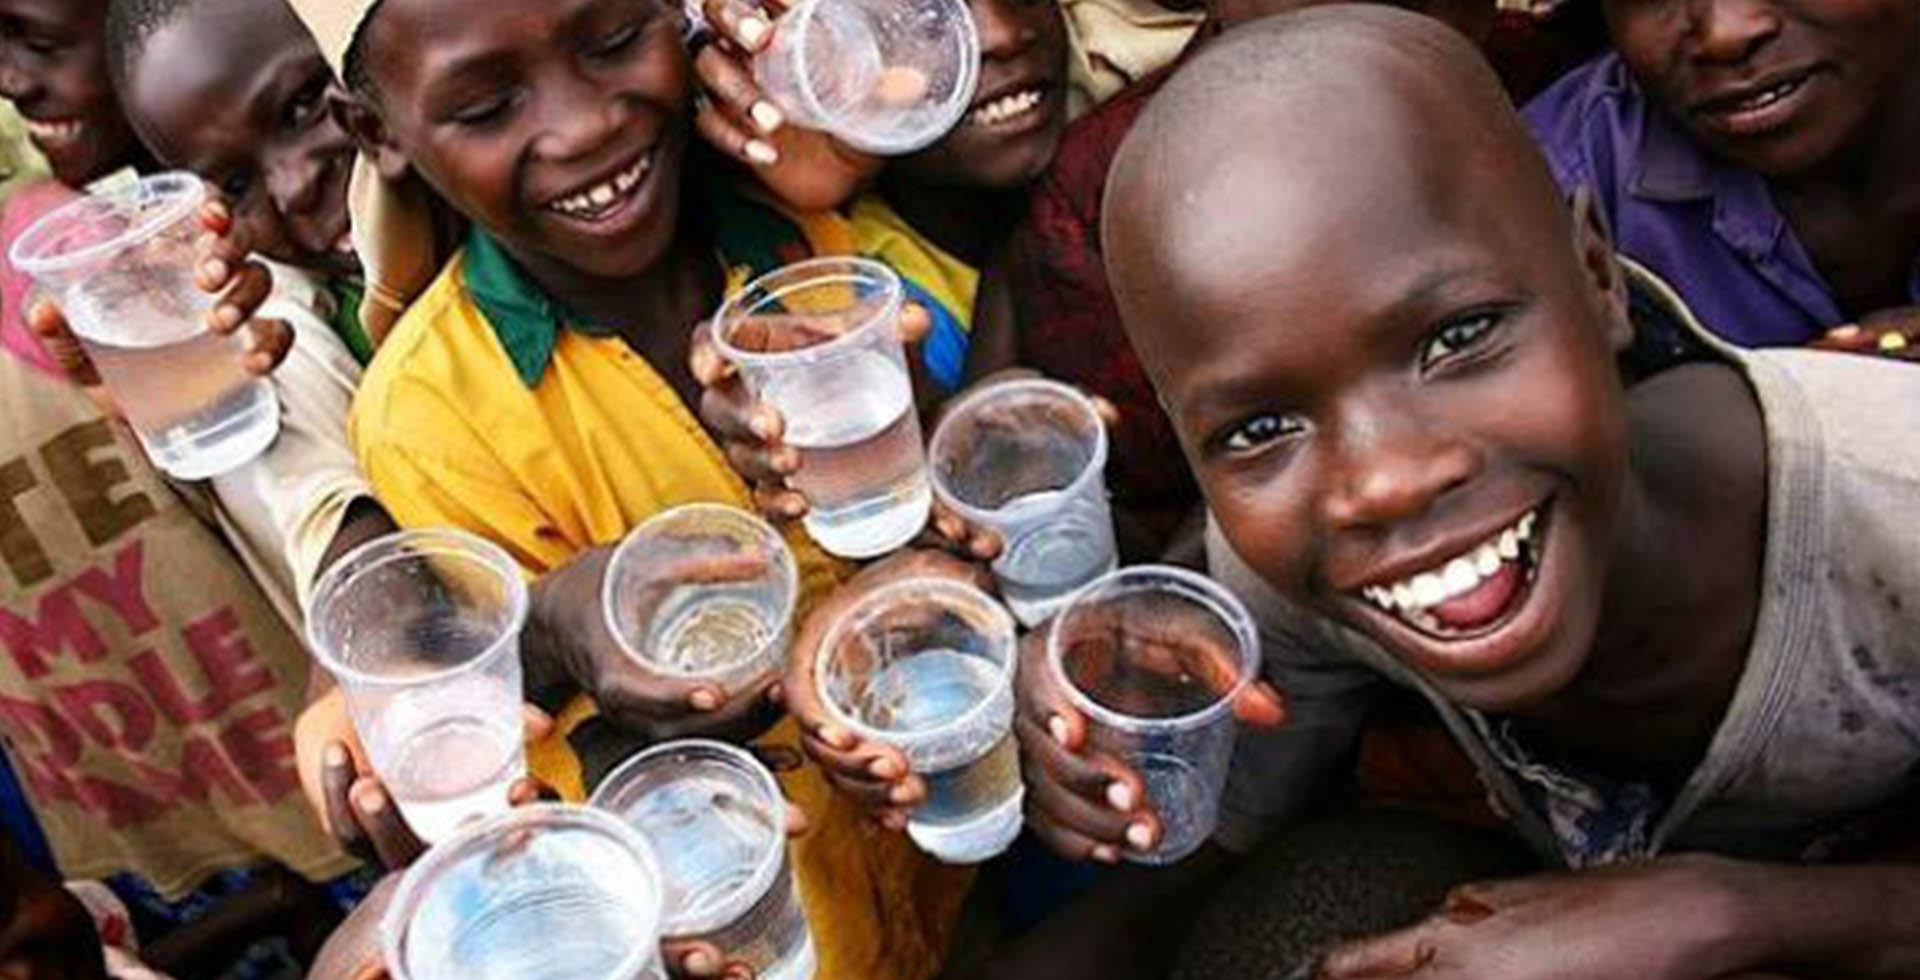 Donazioni onlus garantire Acqua pulita Sud Sudan, Tonjproject